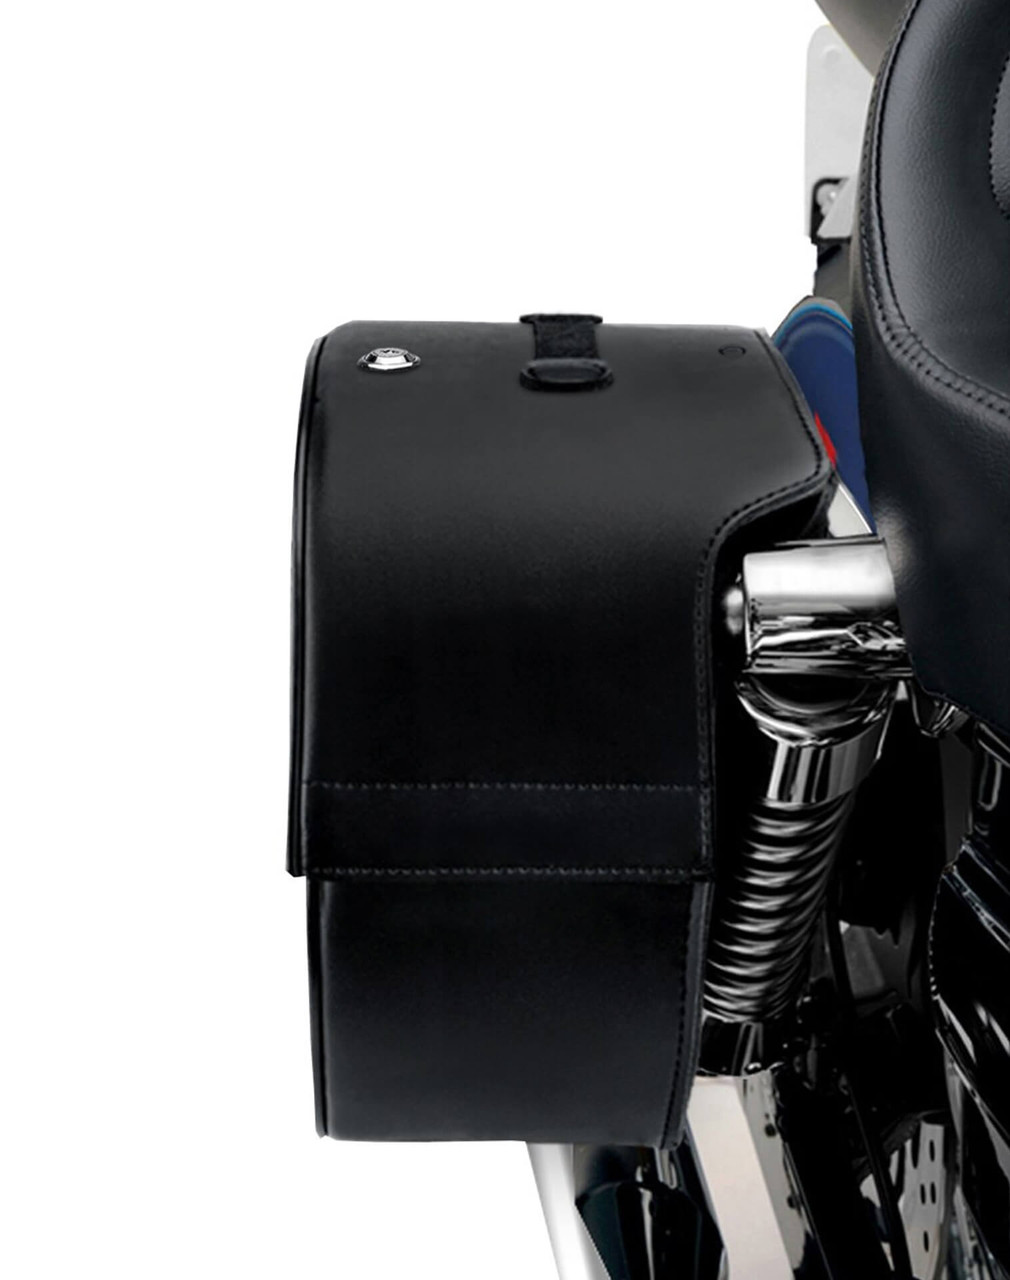 Triumph Rocket III Range Viking Spear Shock Cutout Large Leather Motorcycle Saddlebags Shock Cutout View